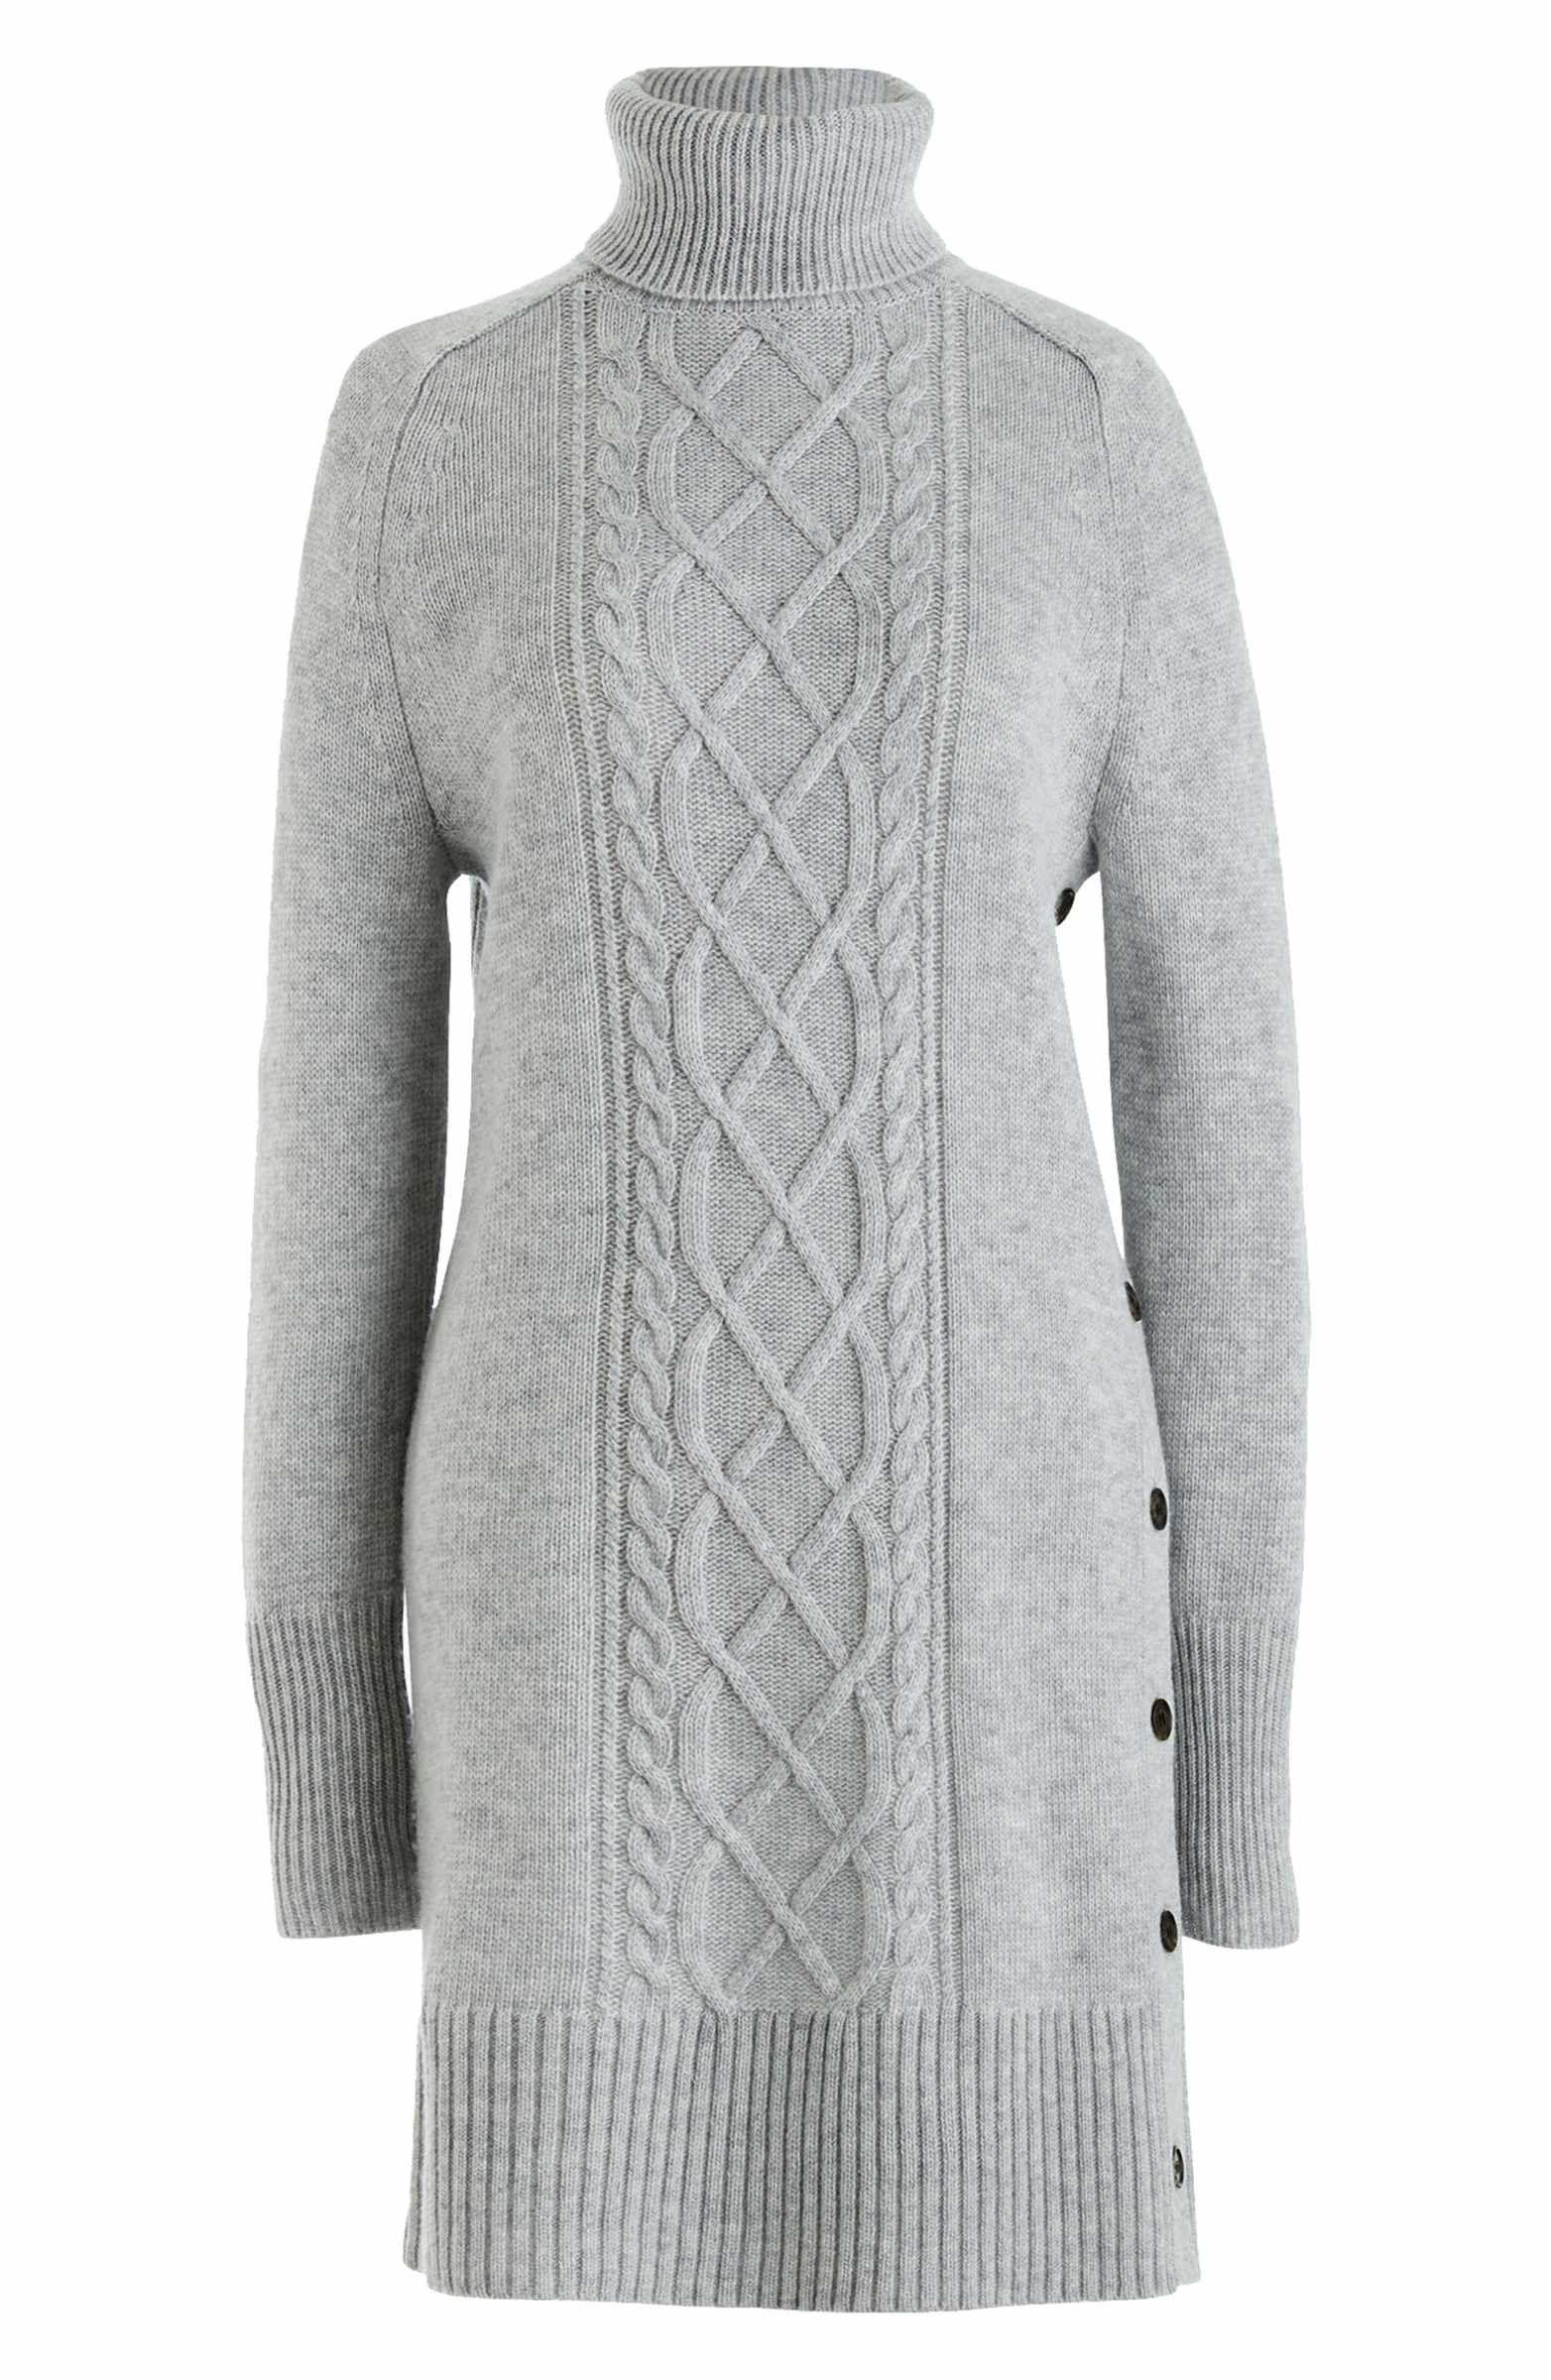 eb73500e1e5 Main Image - J.Crew Cable Knit Turtleneck Sweater Dress